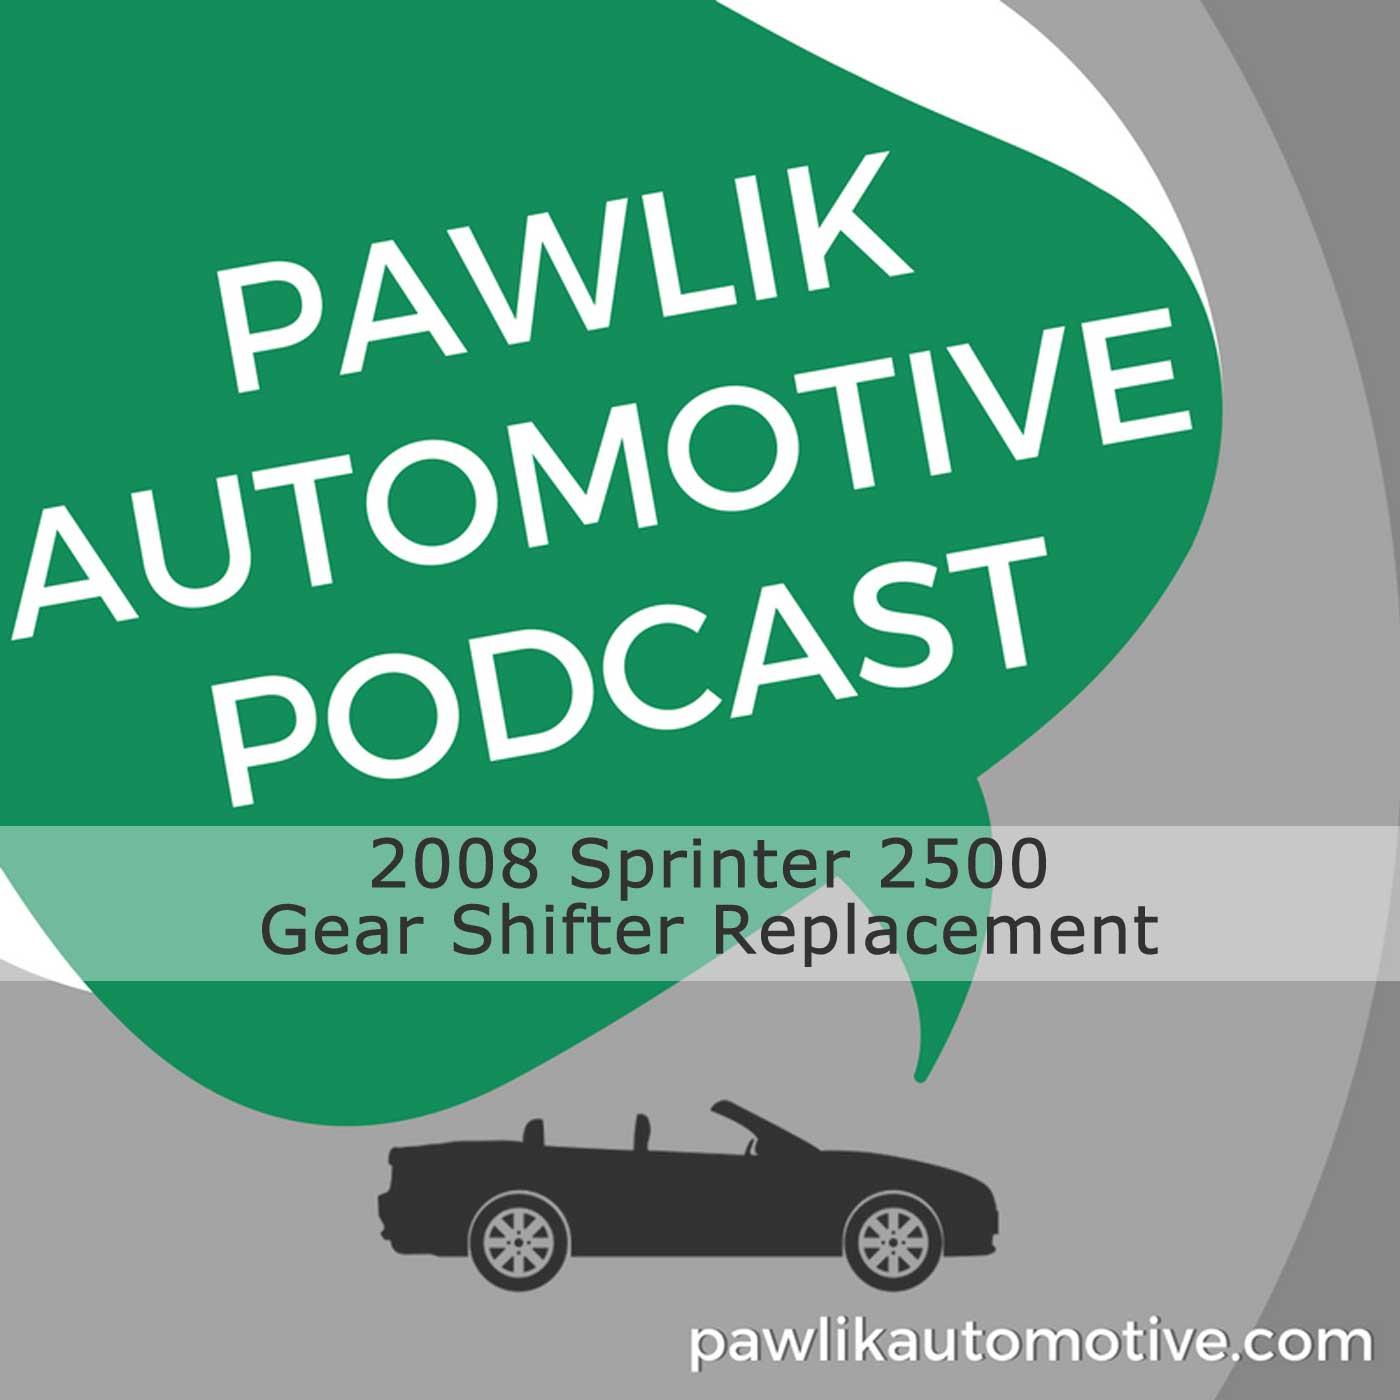 2008 Sprinter 2500-Gear Shifter Replacement- Pawlik Automotive